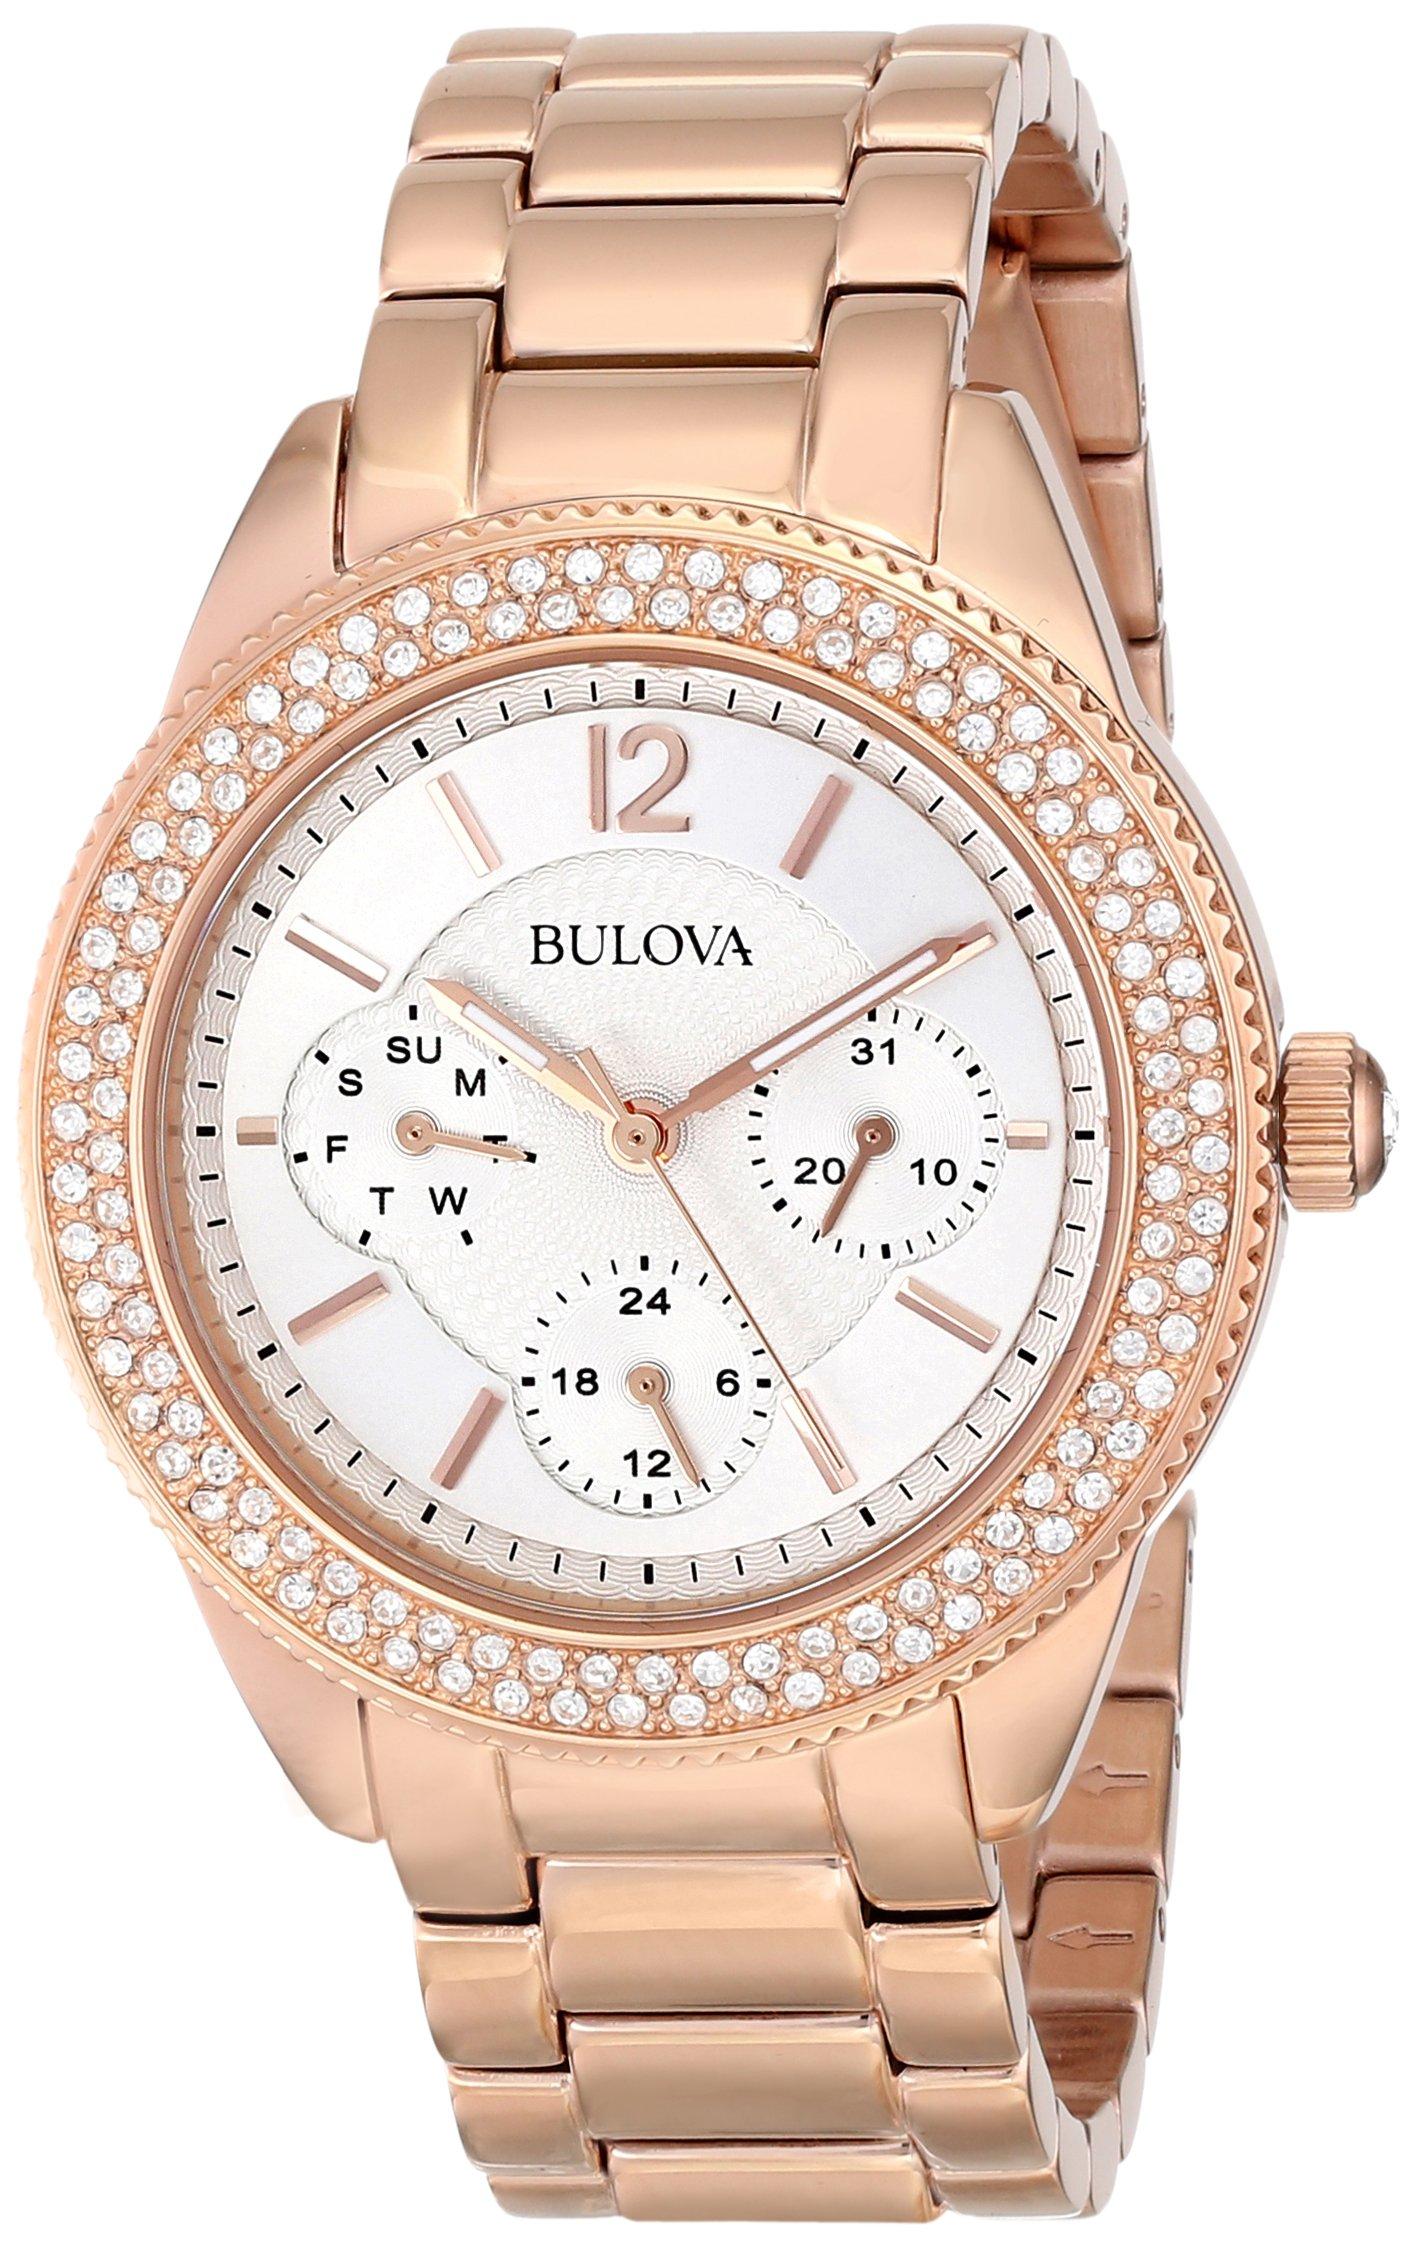 92664d8ce Bulova Women's 97N101 Swarovski Crystal Rose Gold Tone Watch - Get ...